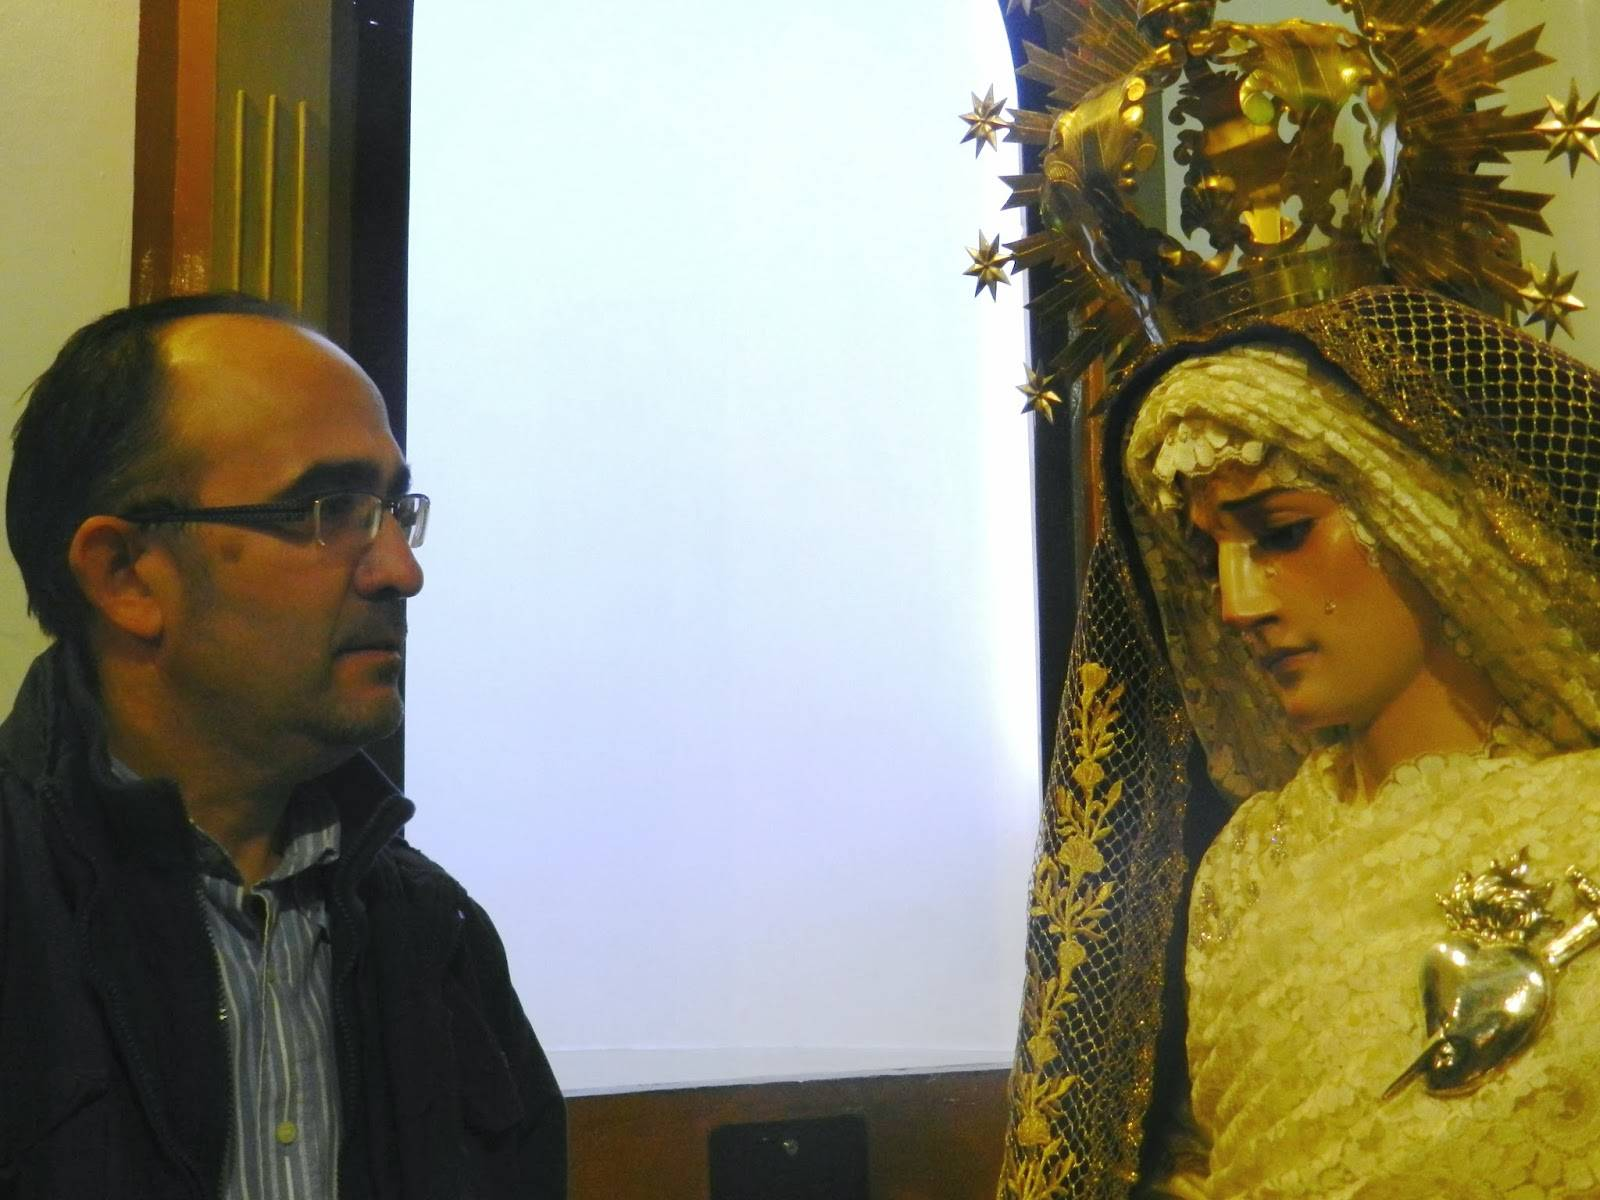 Jesús Fernández-Caballero frente a la Virgen de la Amargura